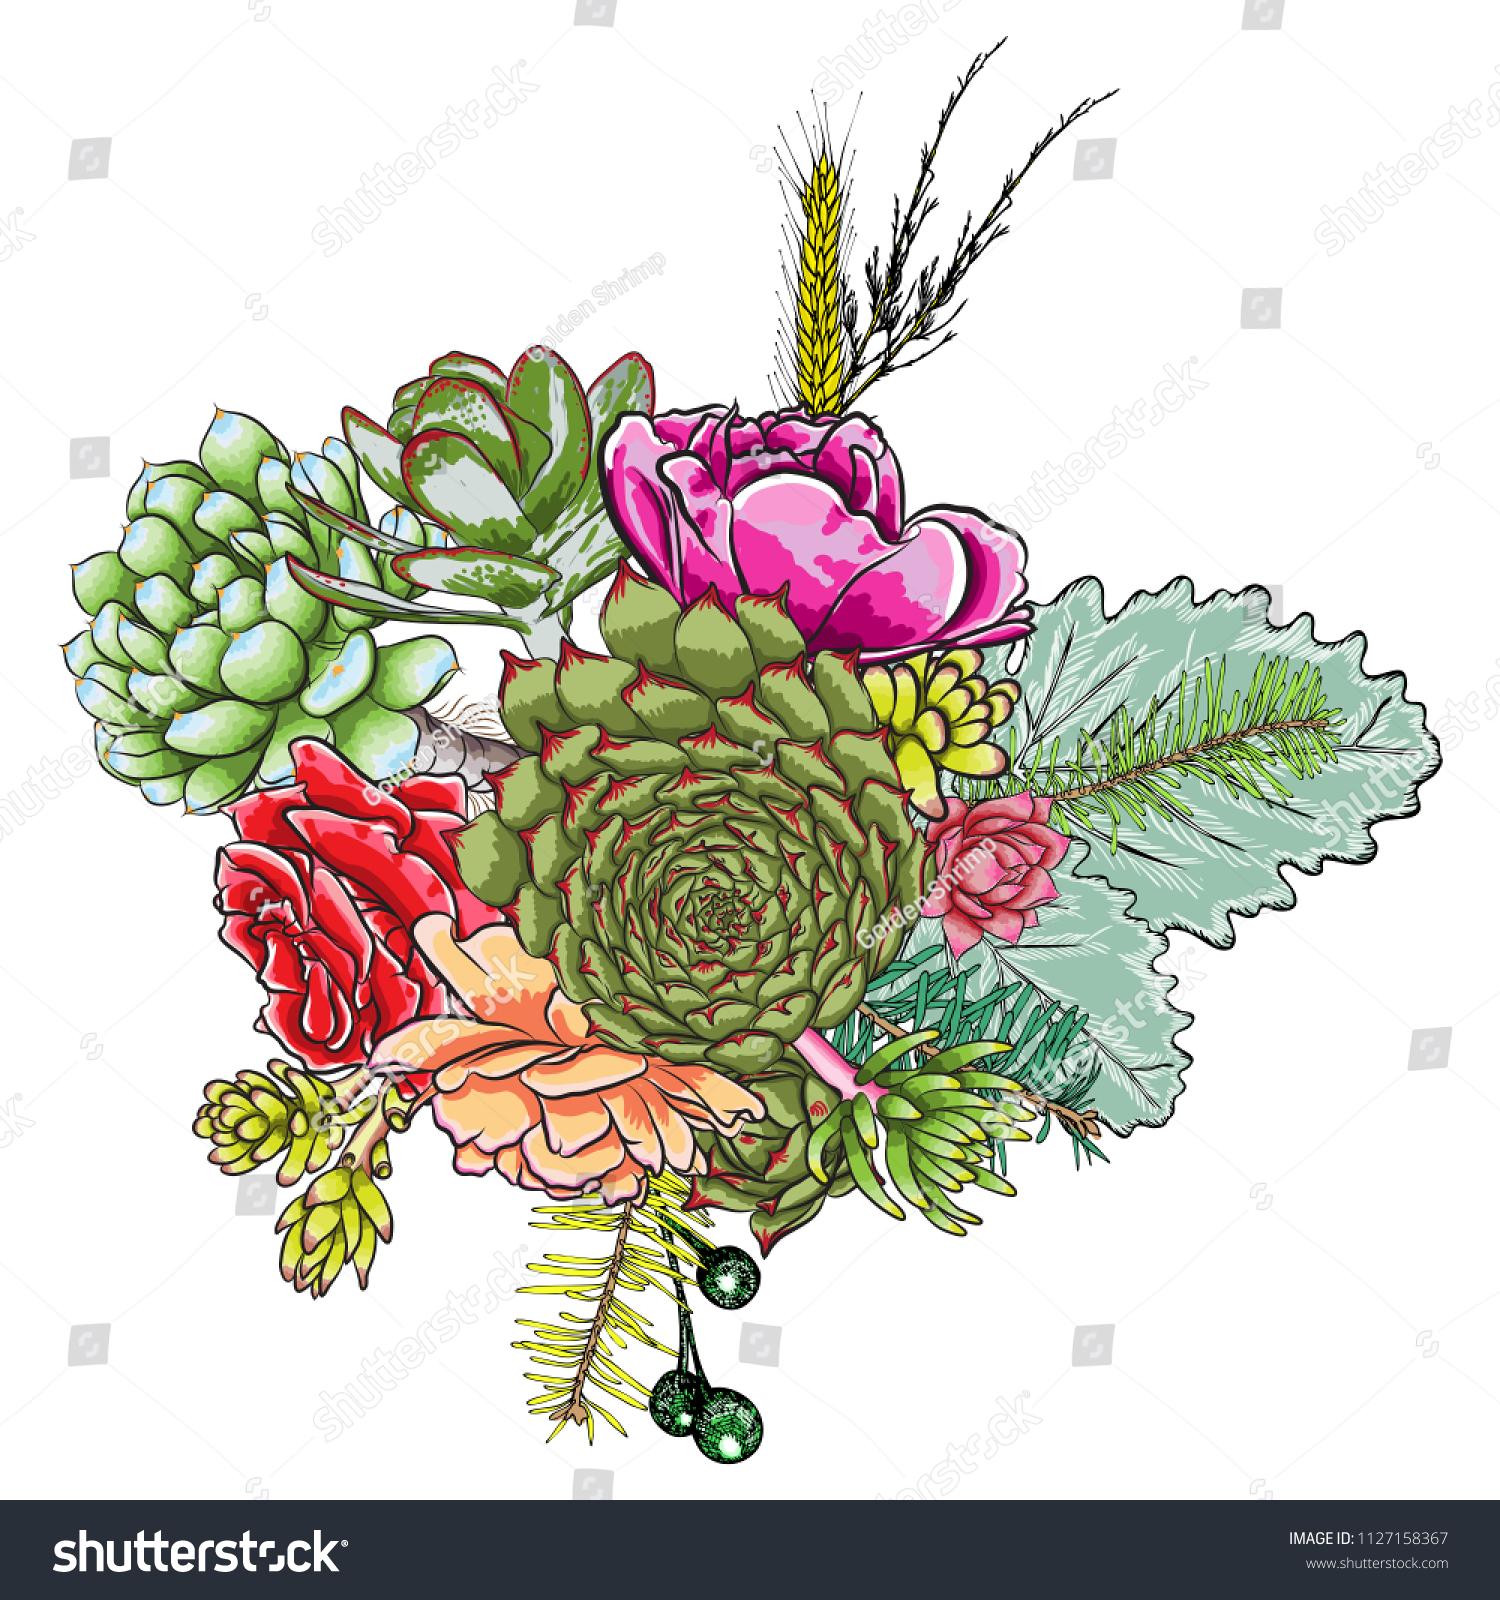 Green Colorful Succulent Echeveria Design Bouquet Stock Vector Royalty Free 1127158367